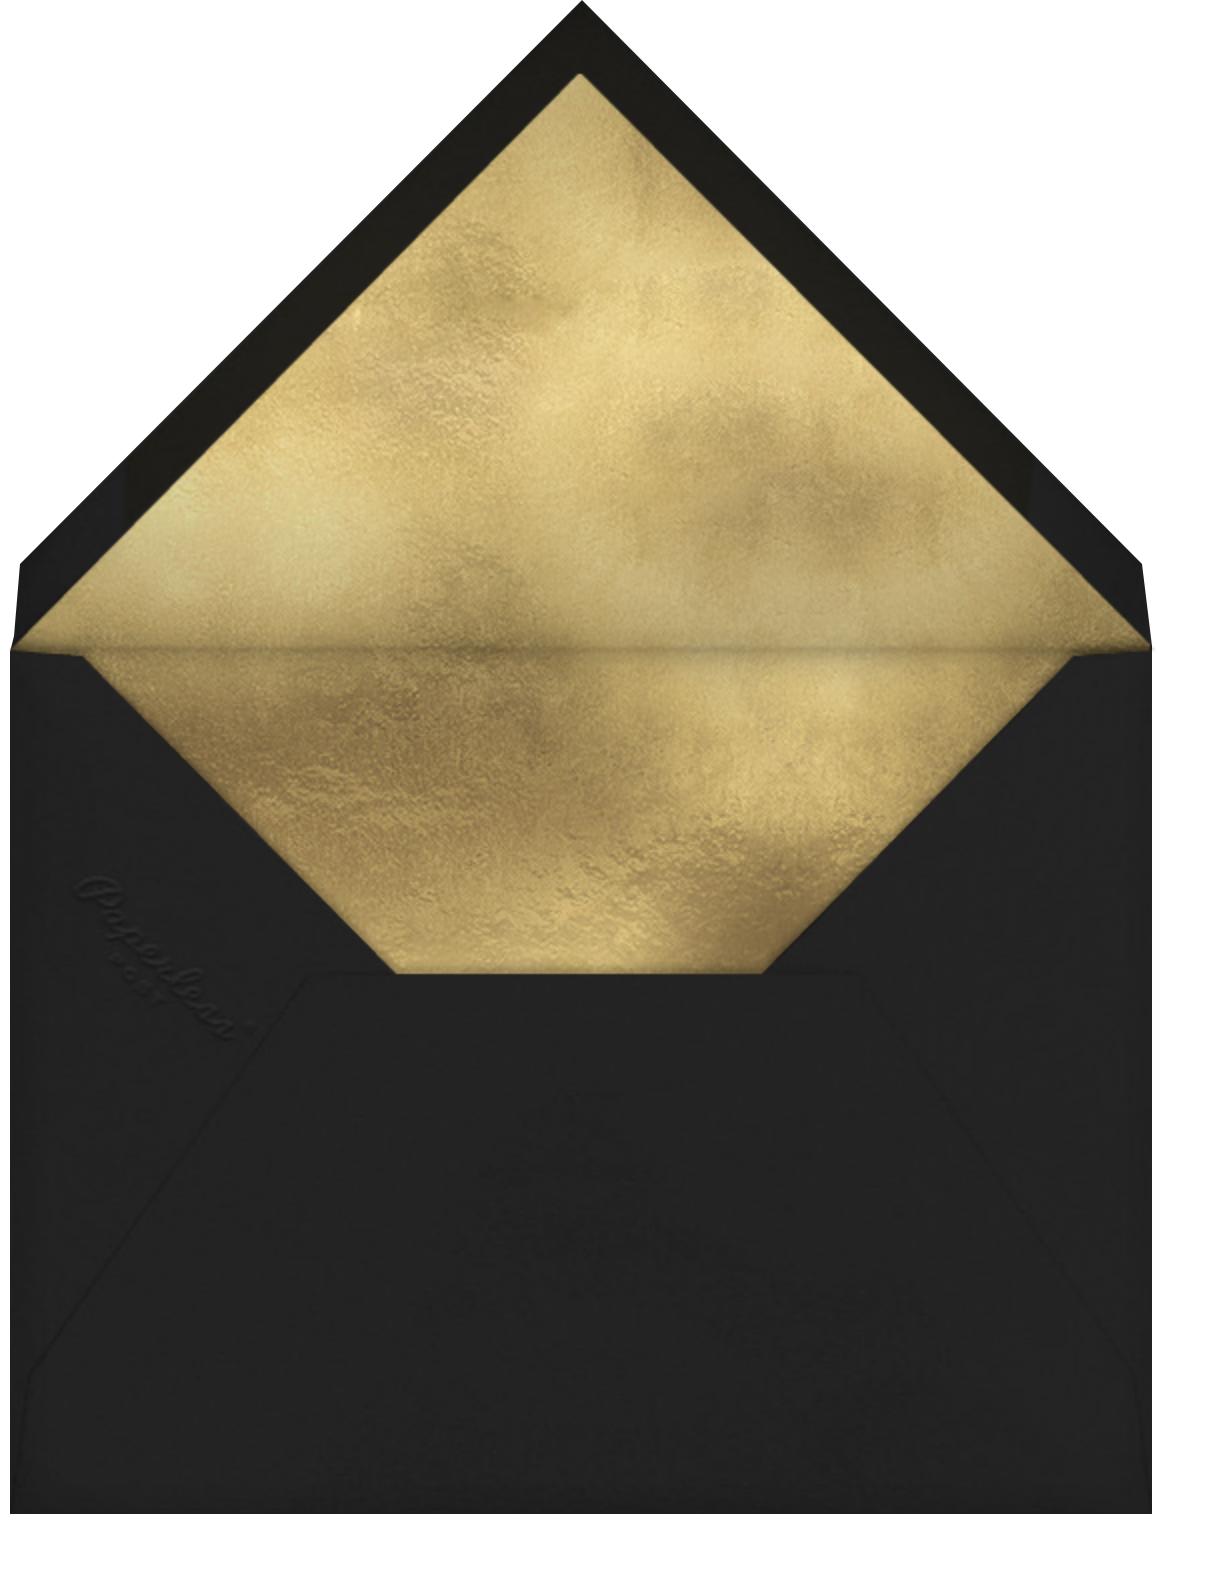 Leopard - Caviar - kate spade new york - Bachelorette party - envelope back